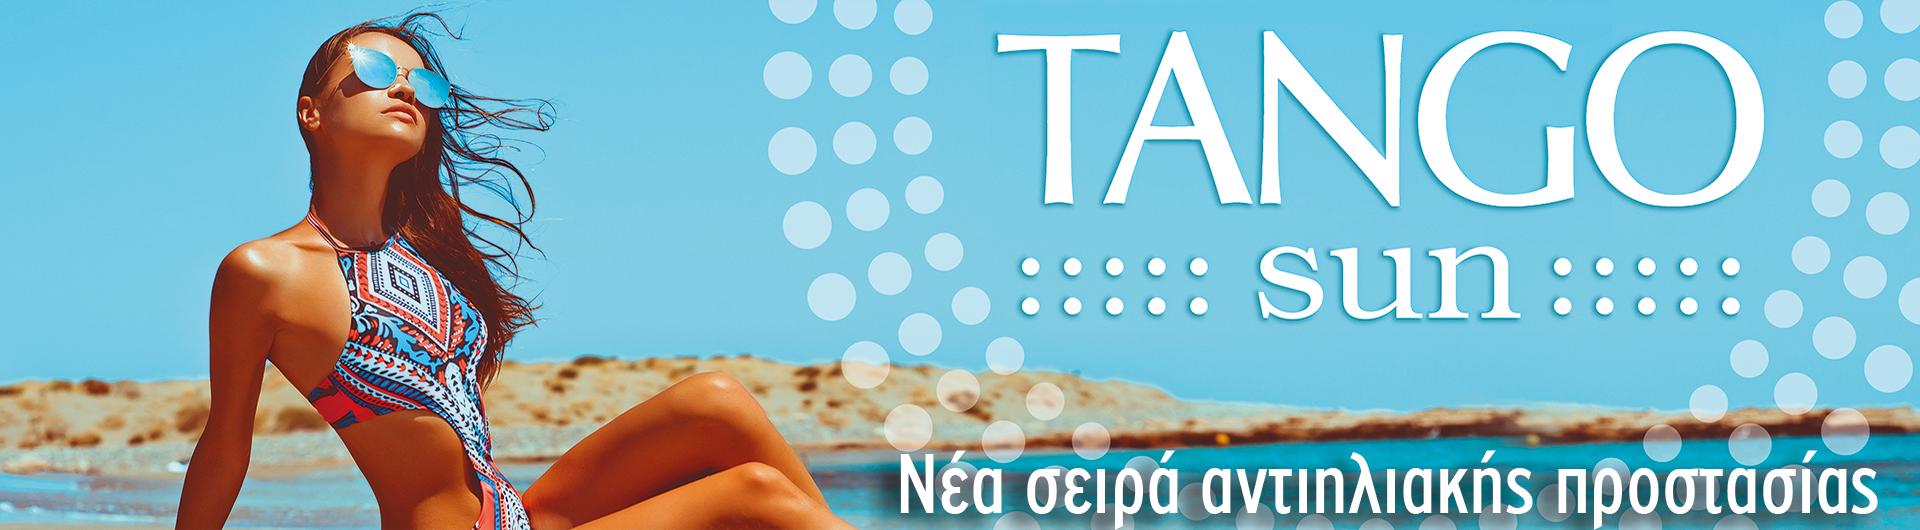 Tango Sun - Νέα Σειρά Αντιηλιακής Προστασίας